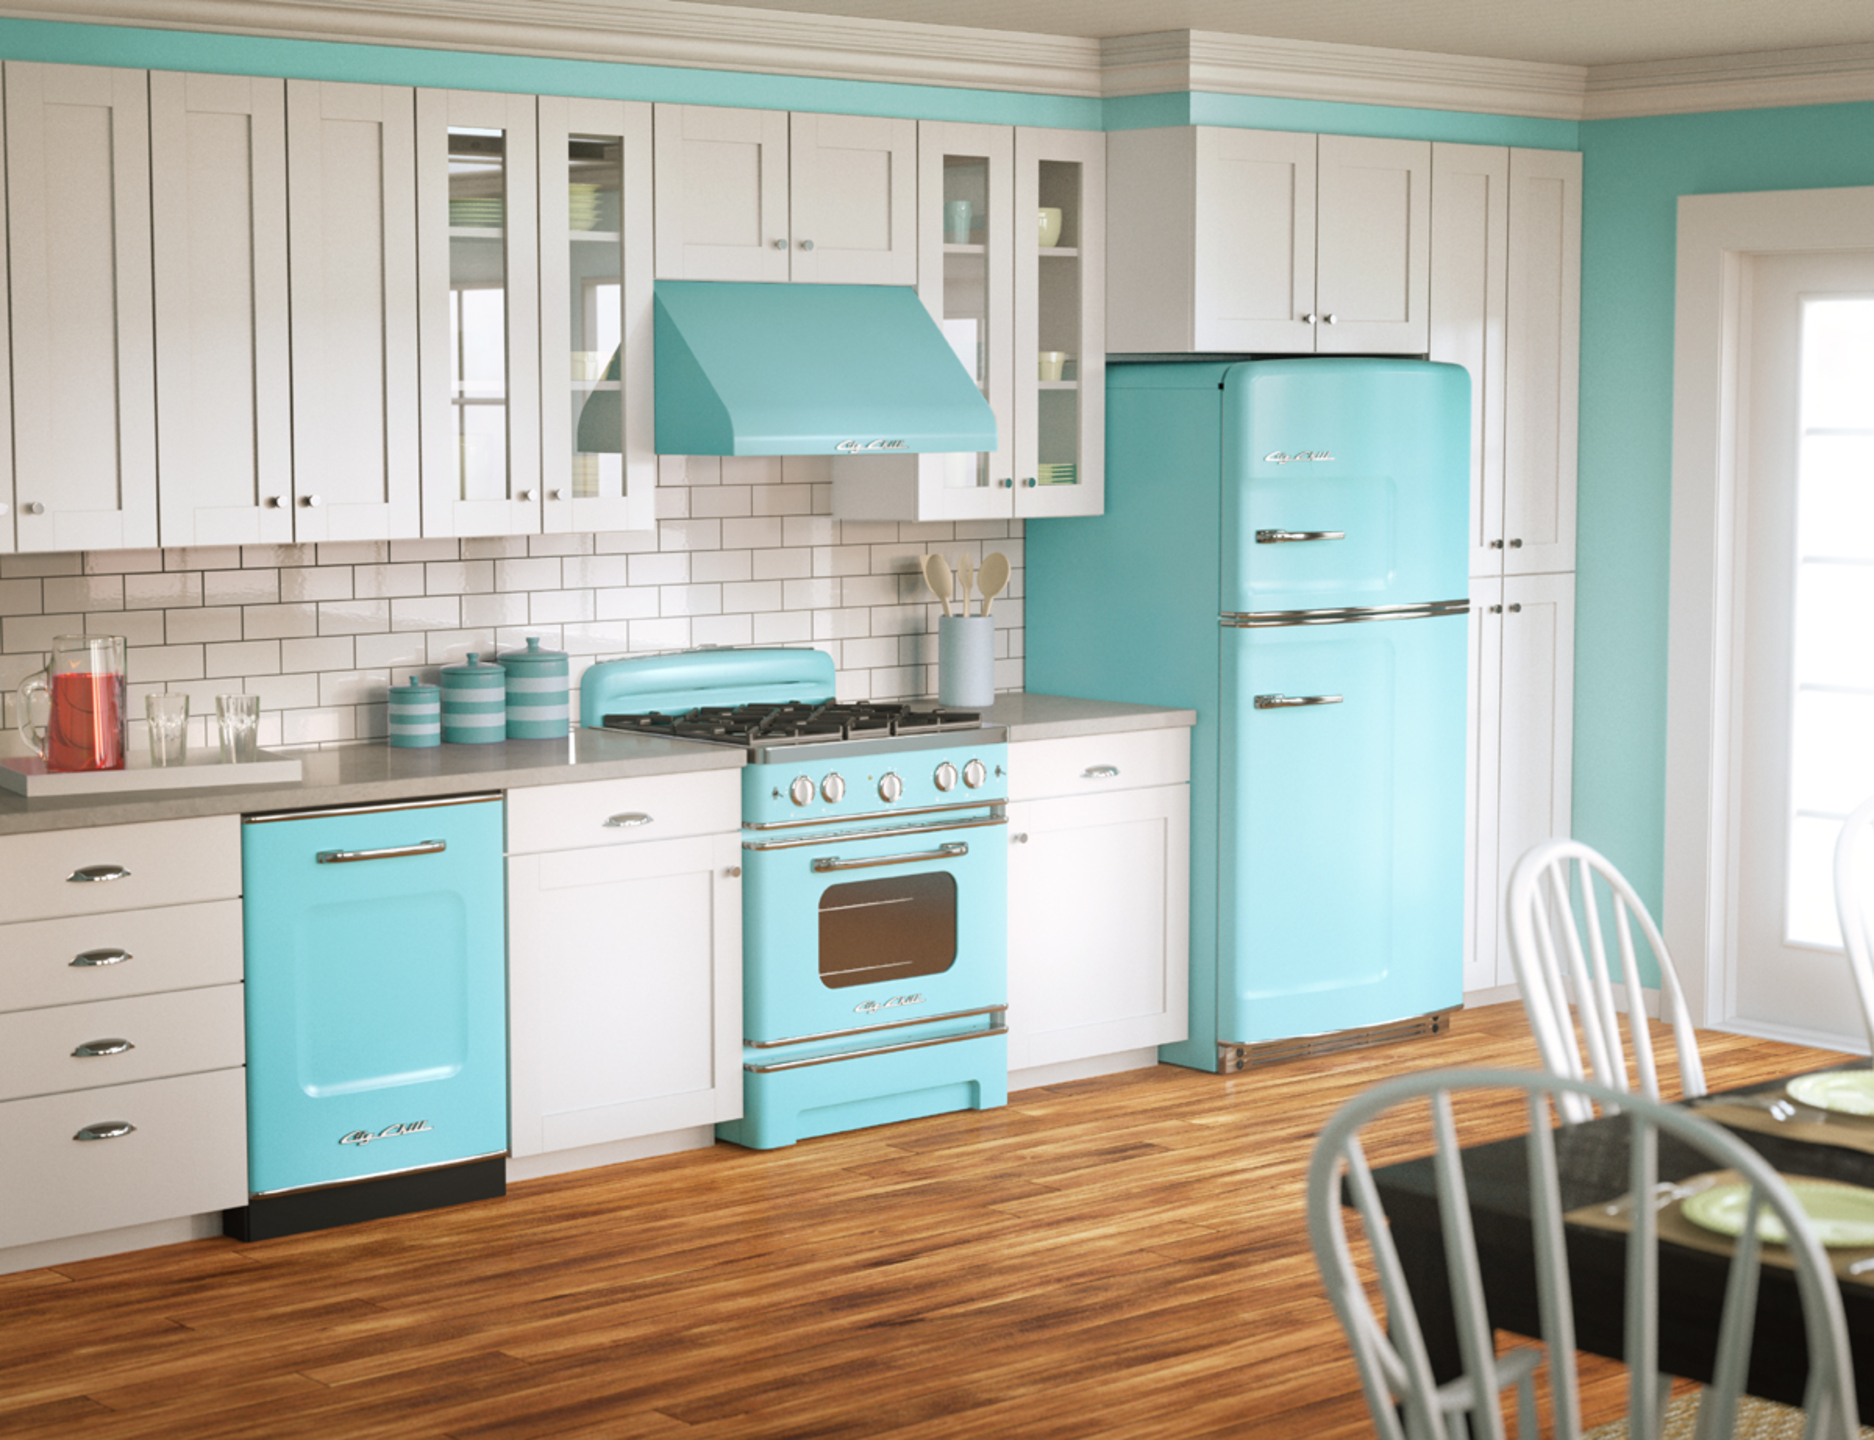 Uncategorized Retro Kitchen Design modern retro kitchen design ideas her view from home ideas